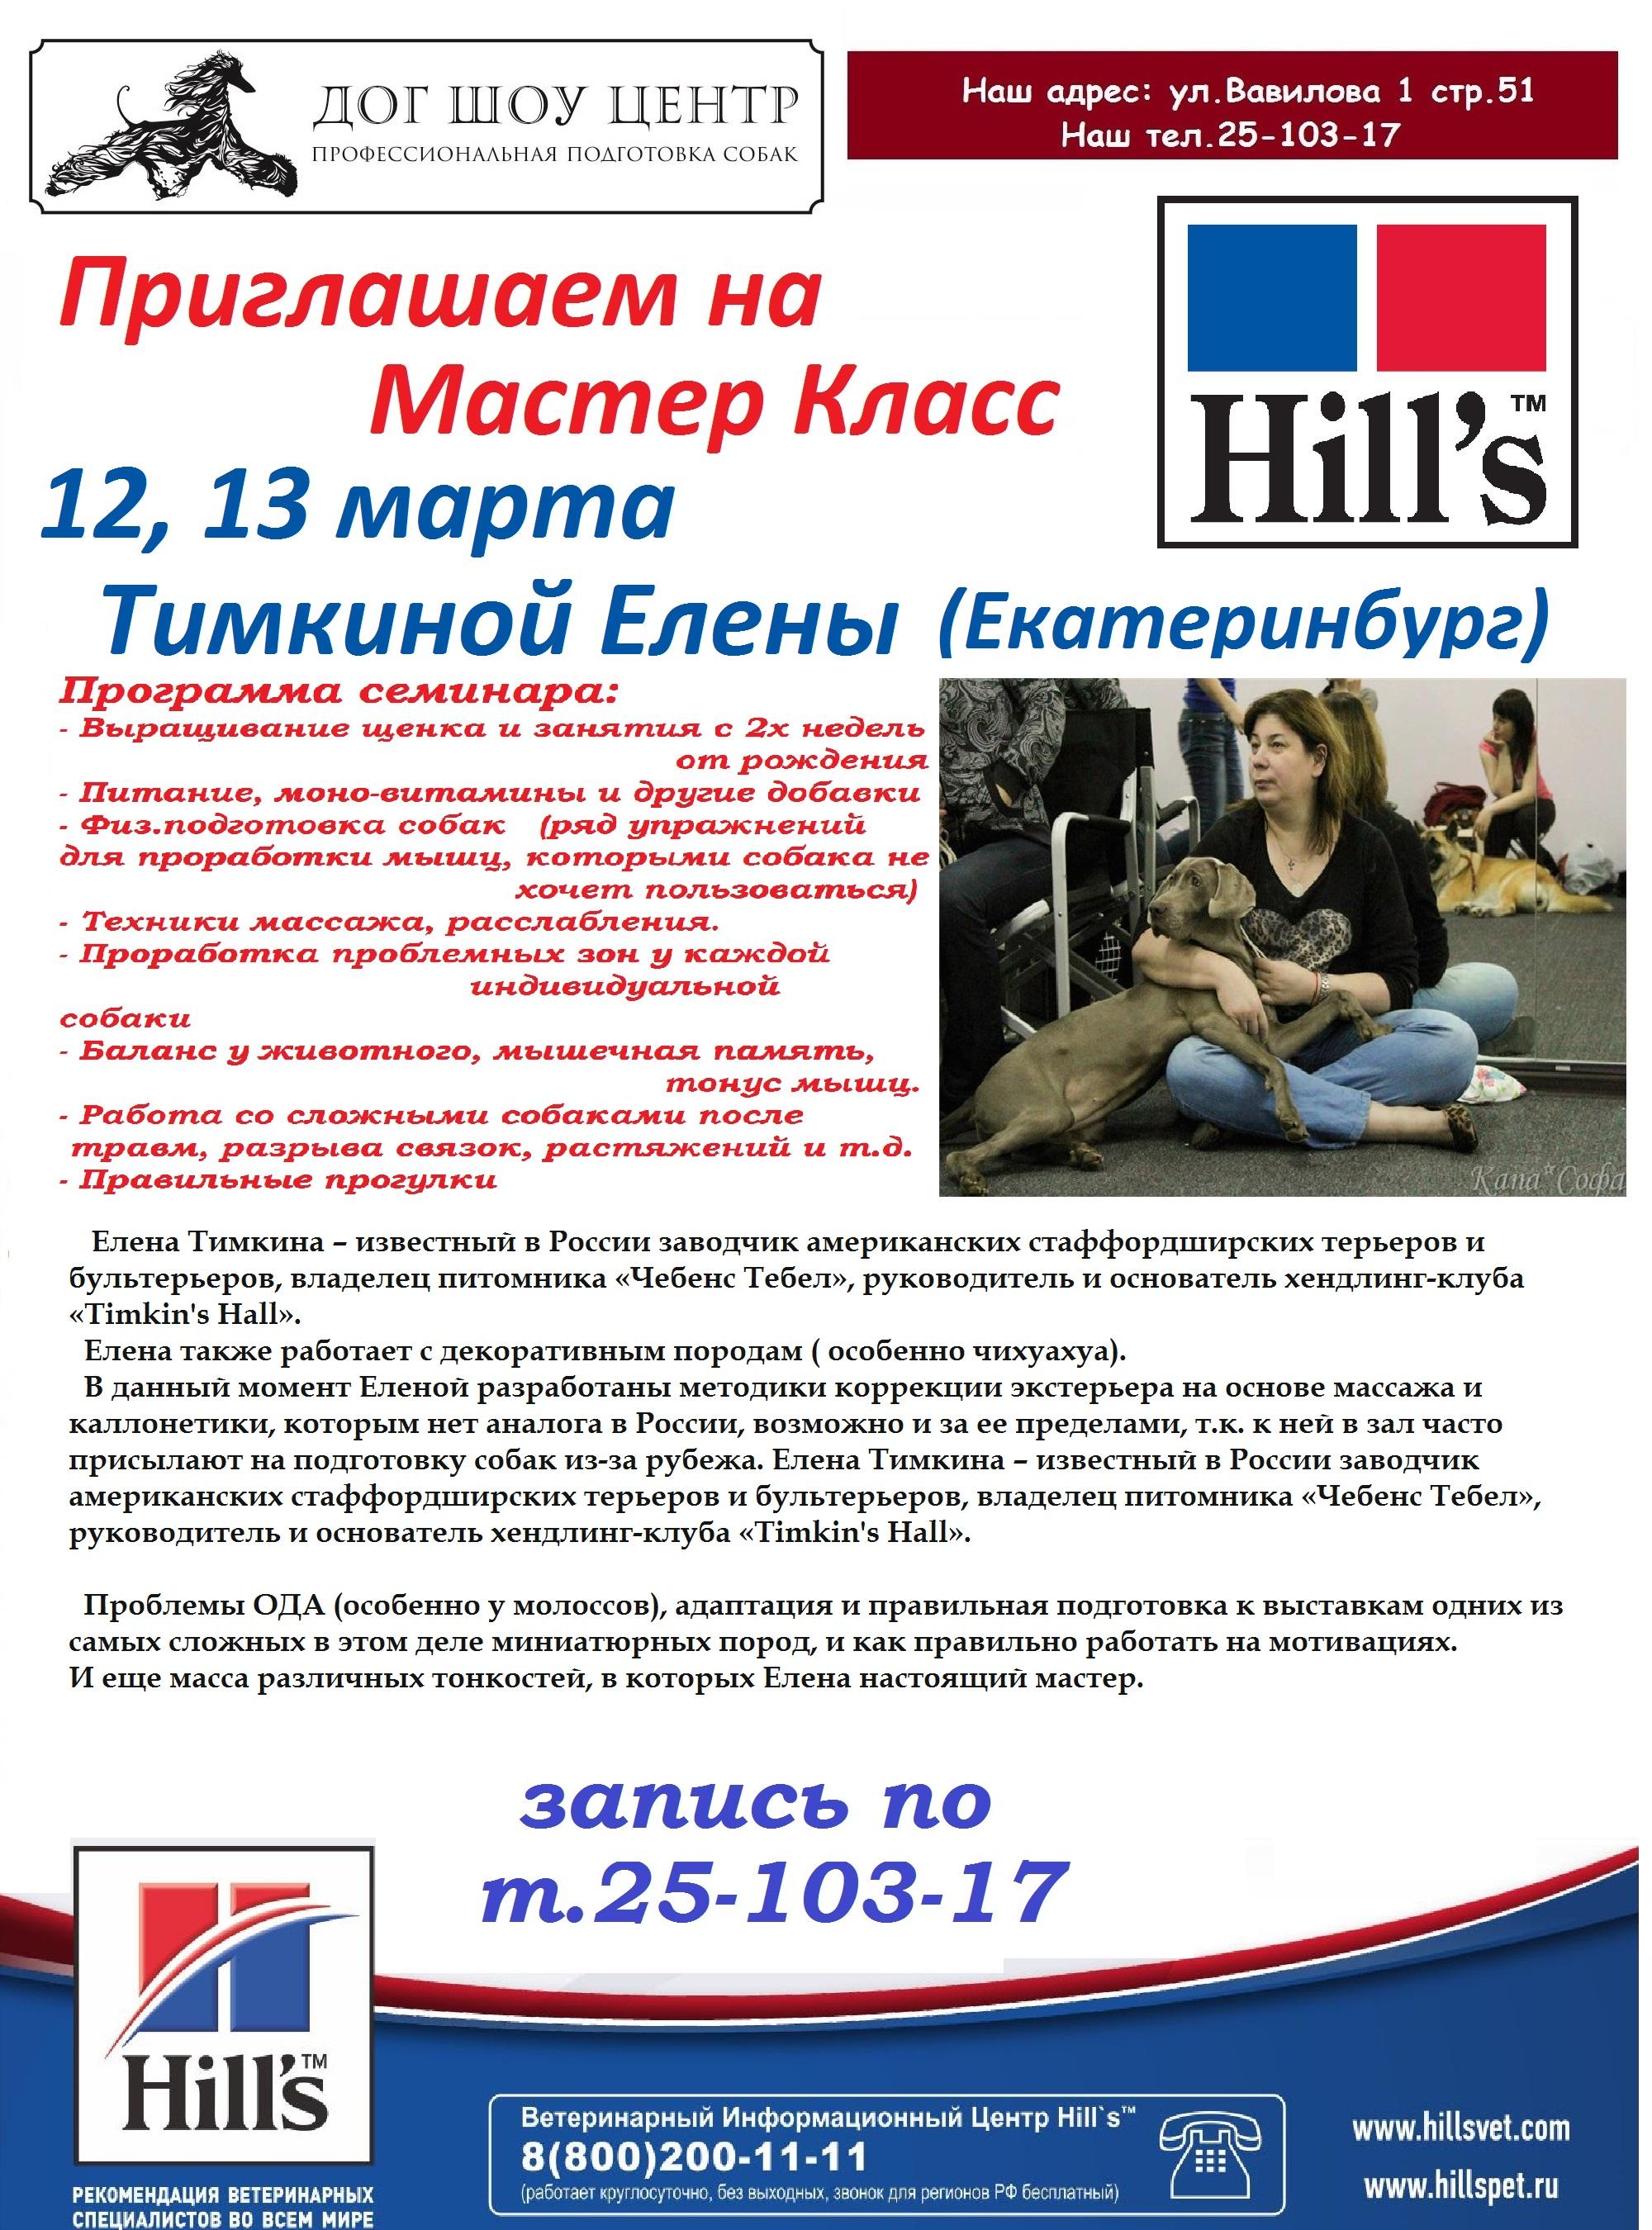 http://s3.uploads.ru/0wE76.jpg